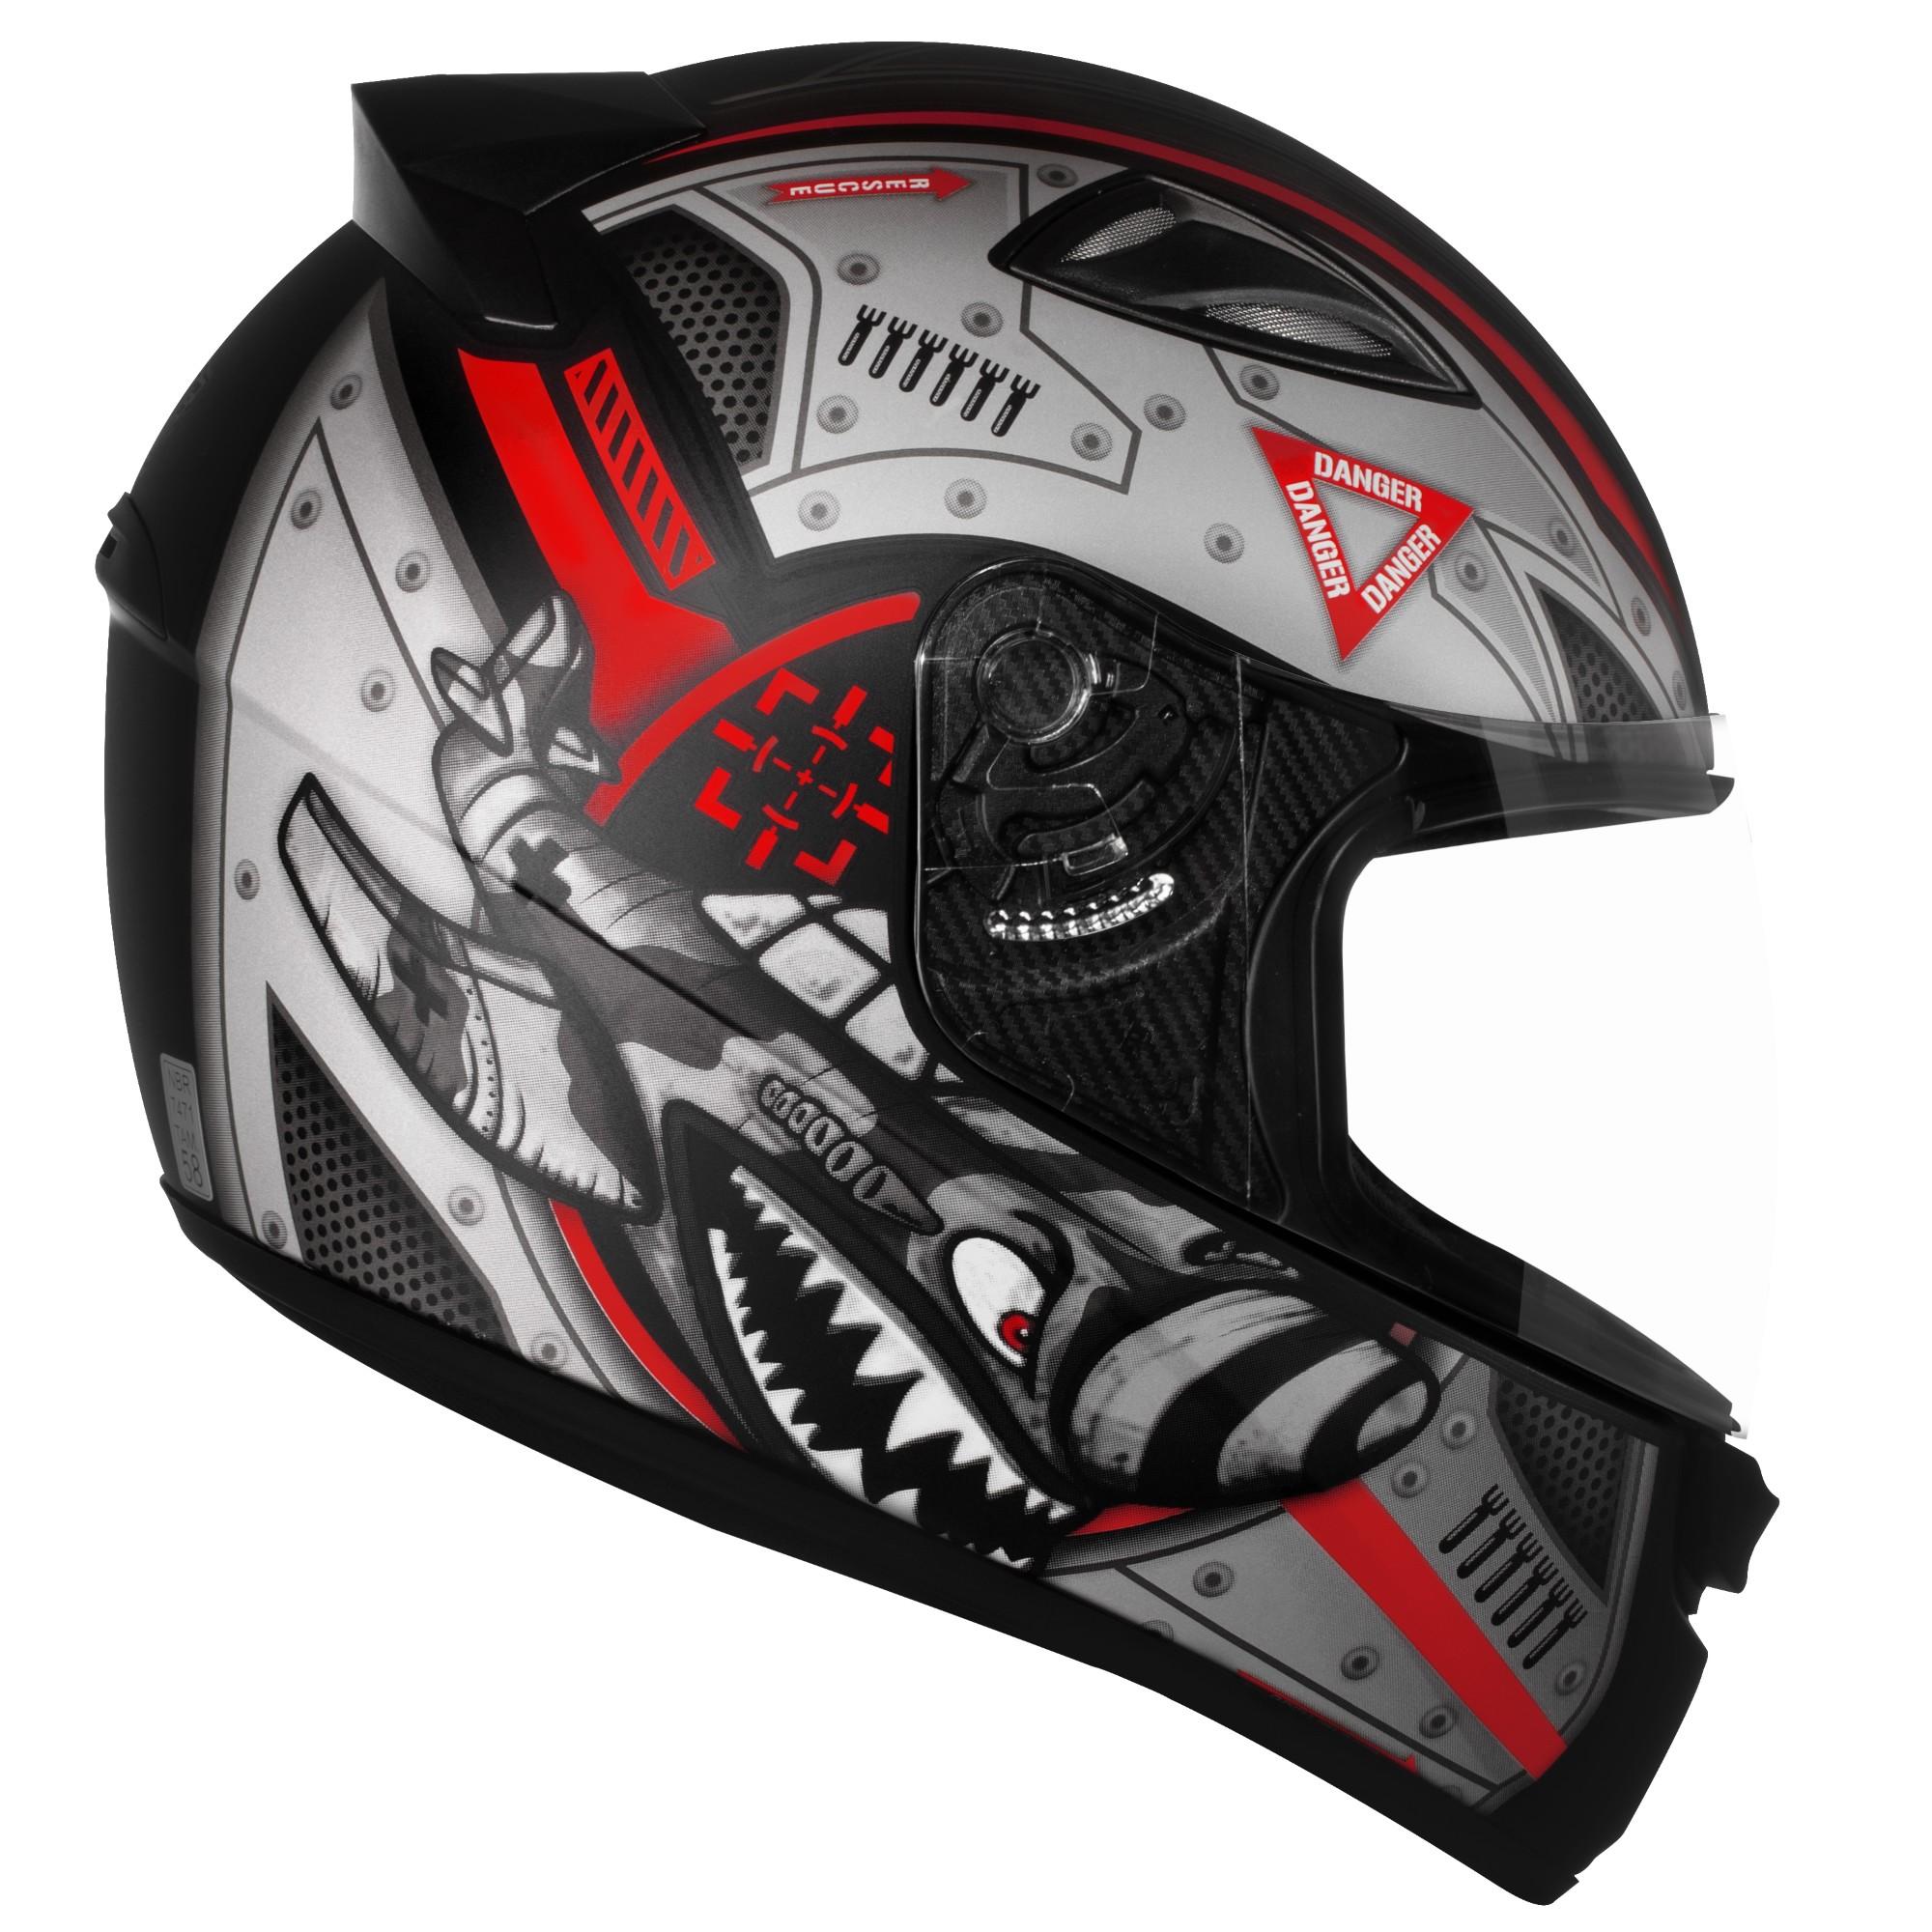 Capacete para Motociclista Integral M M Ebf Capacetes - 6058